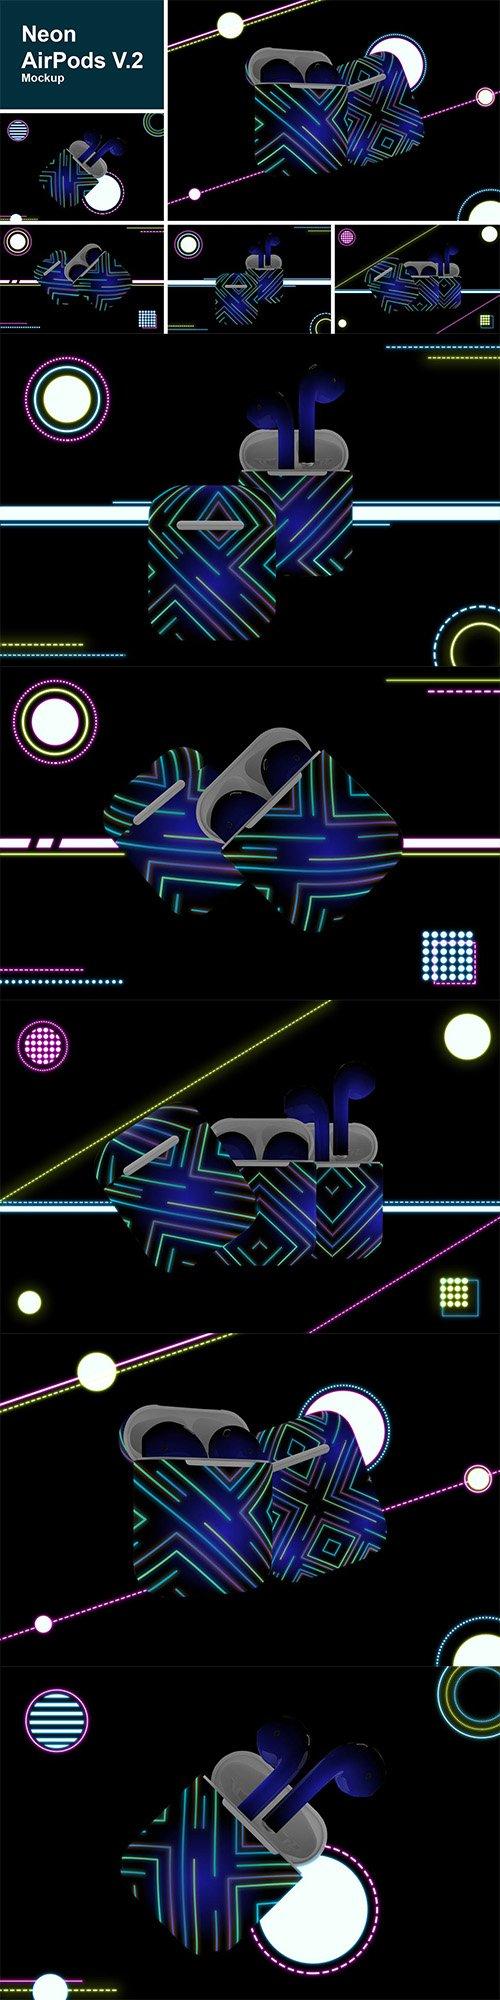 Neon Airpods mockup V.2